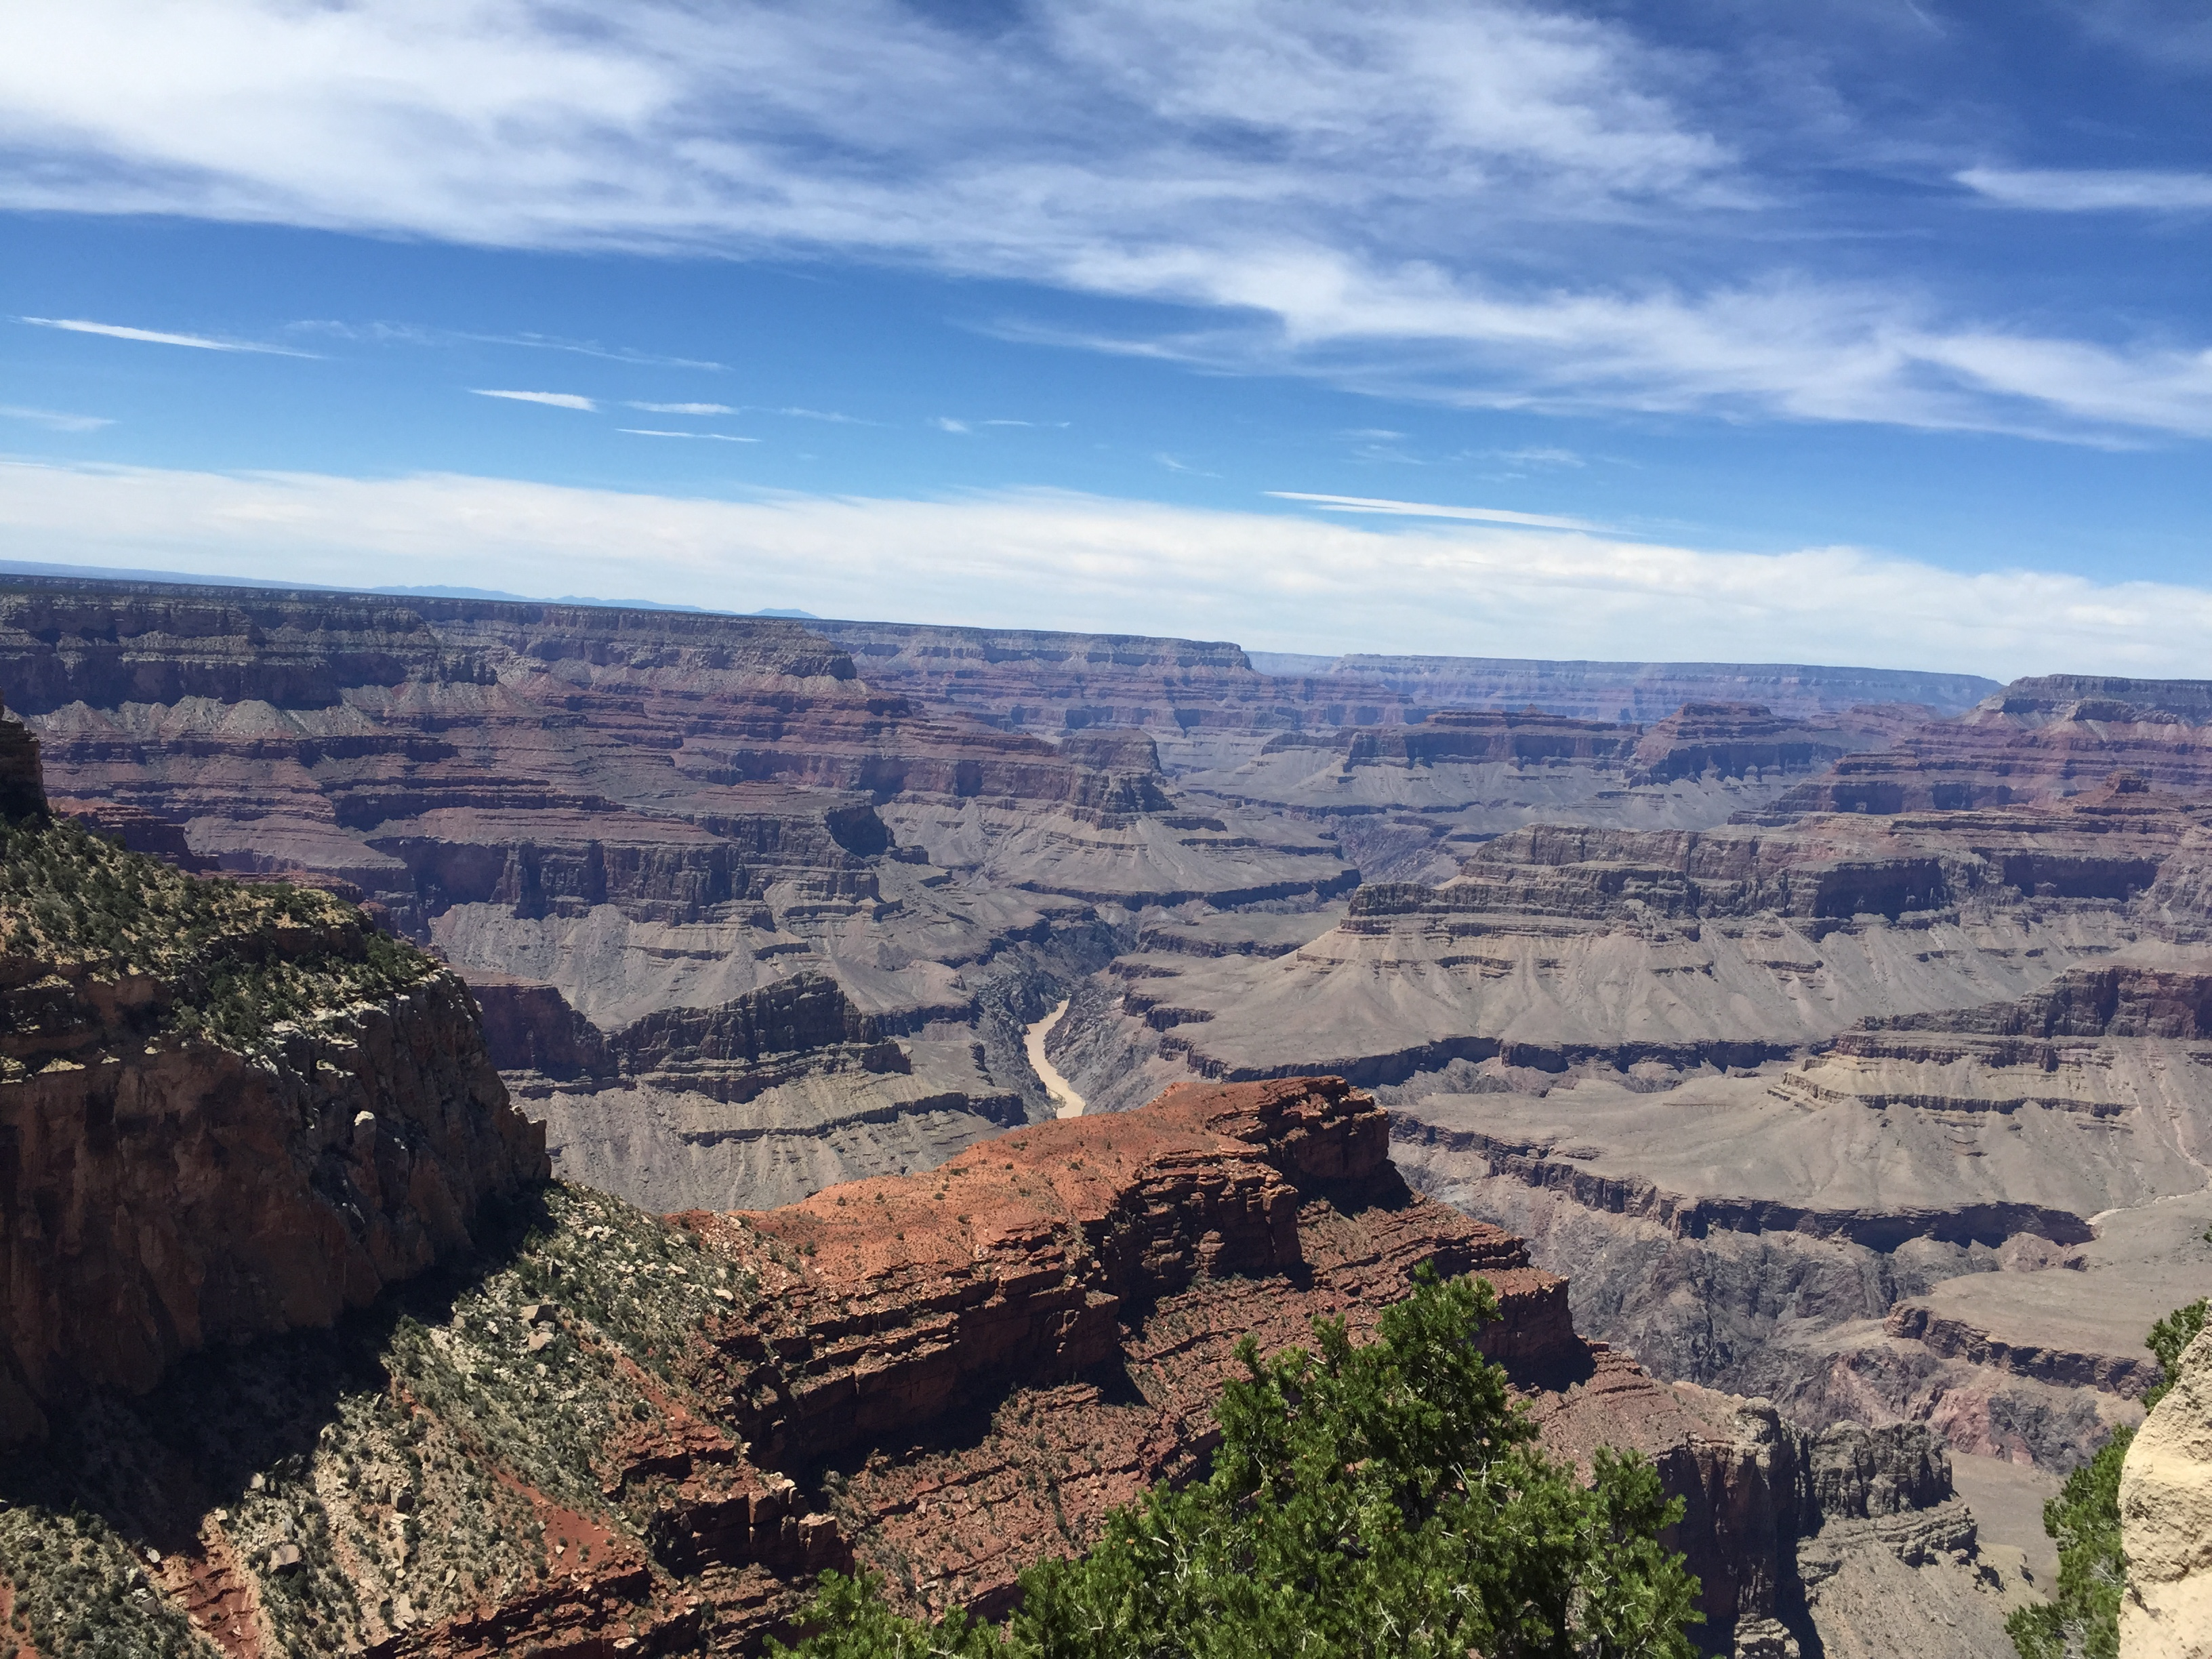 vive_les_vacances_grand_canyon